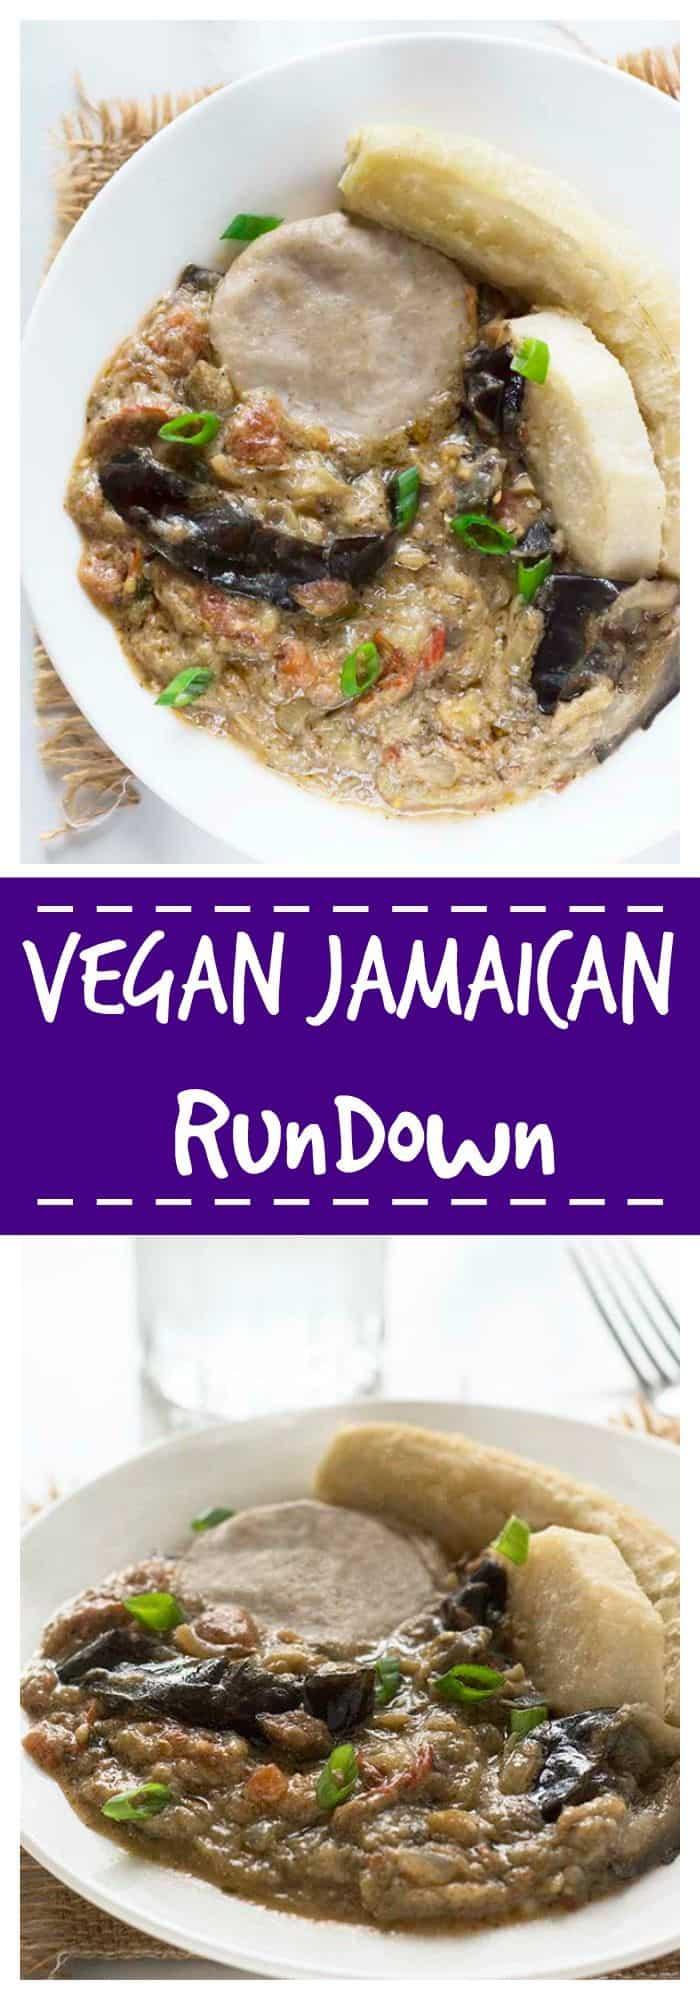 Vegan Jamaican Rundown Recipe